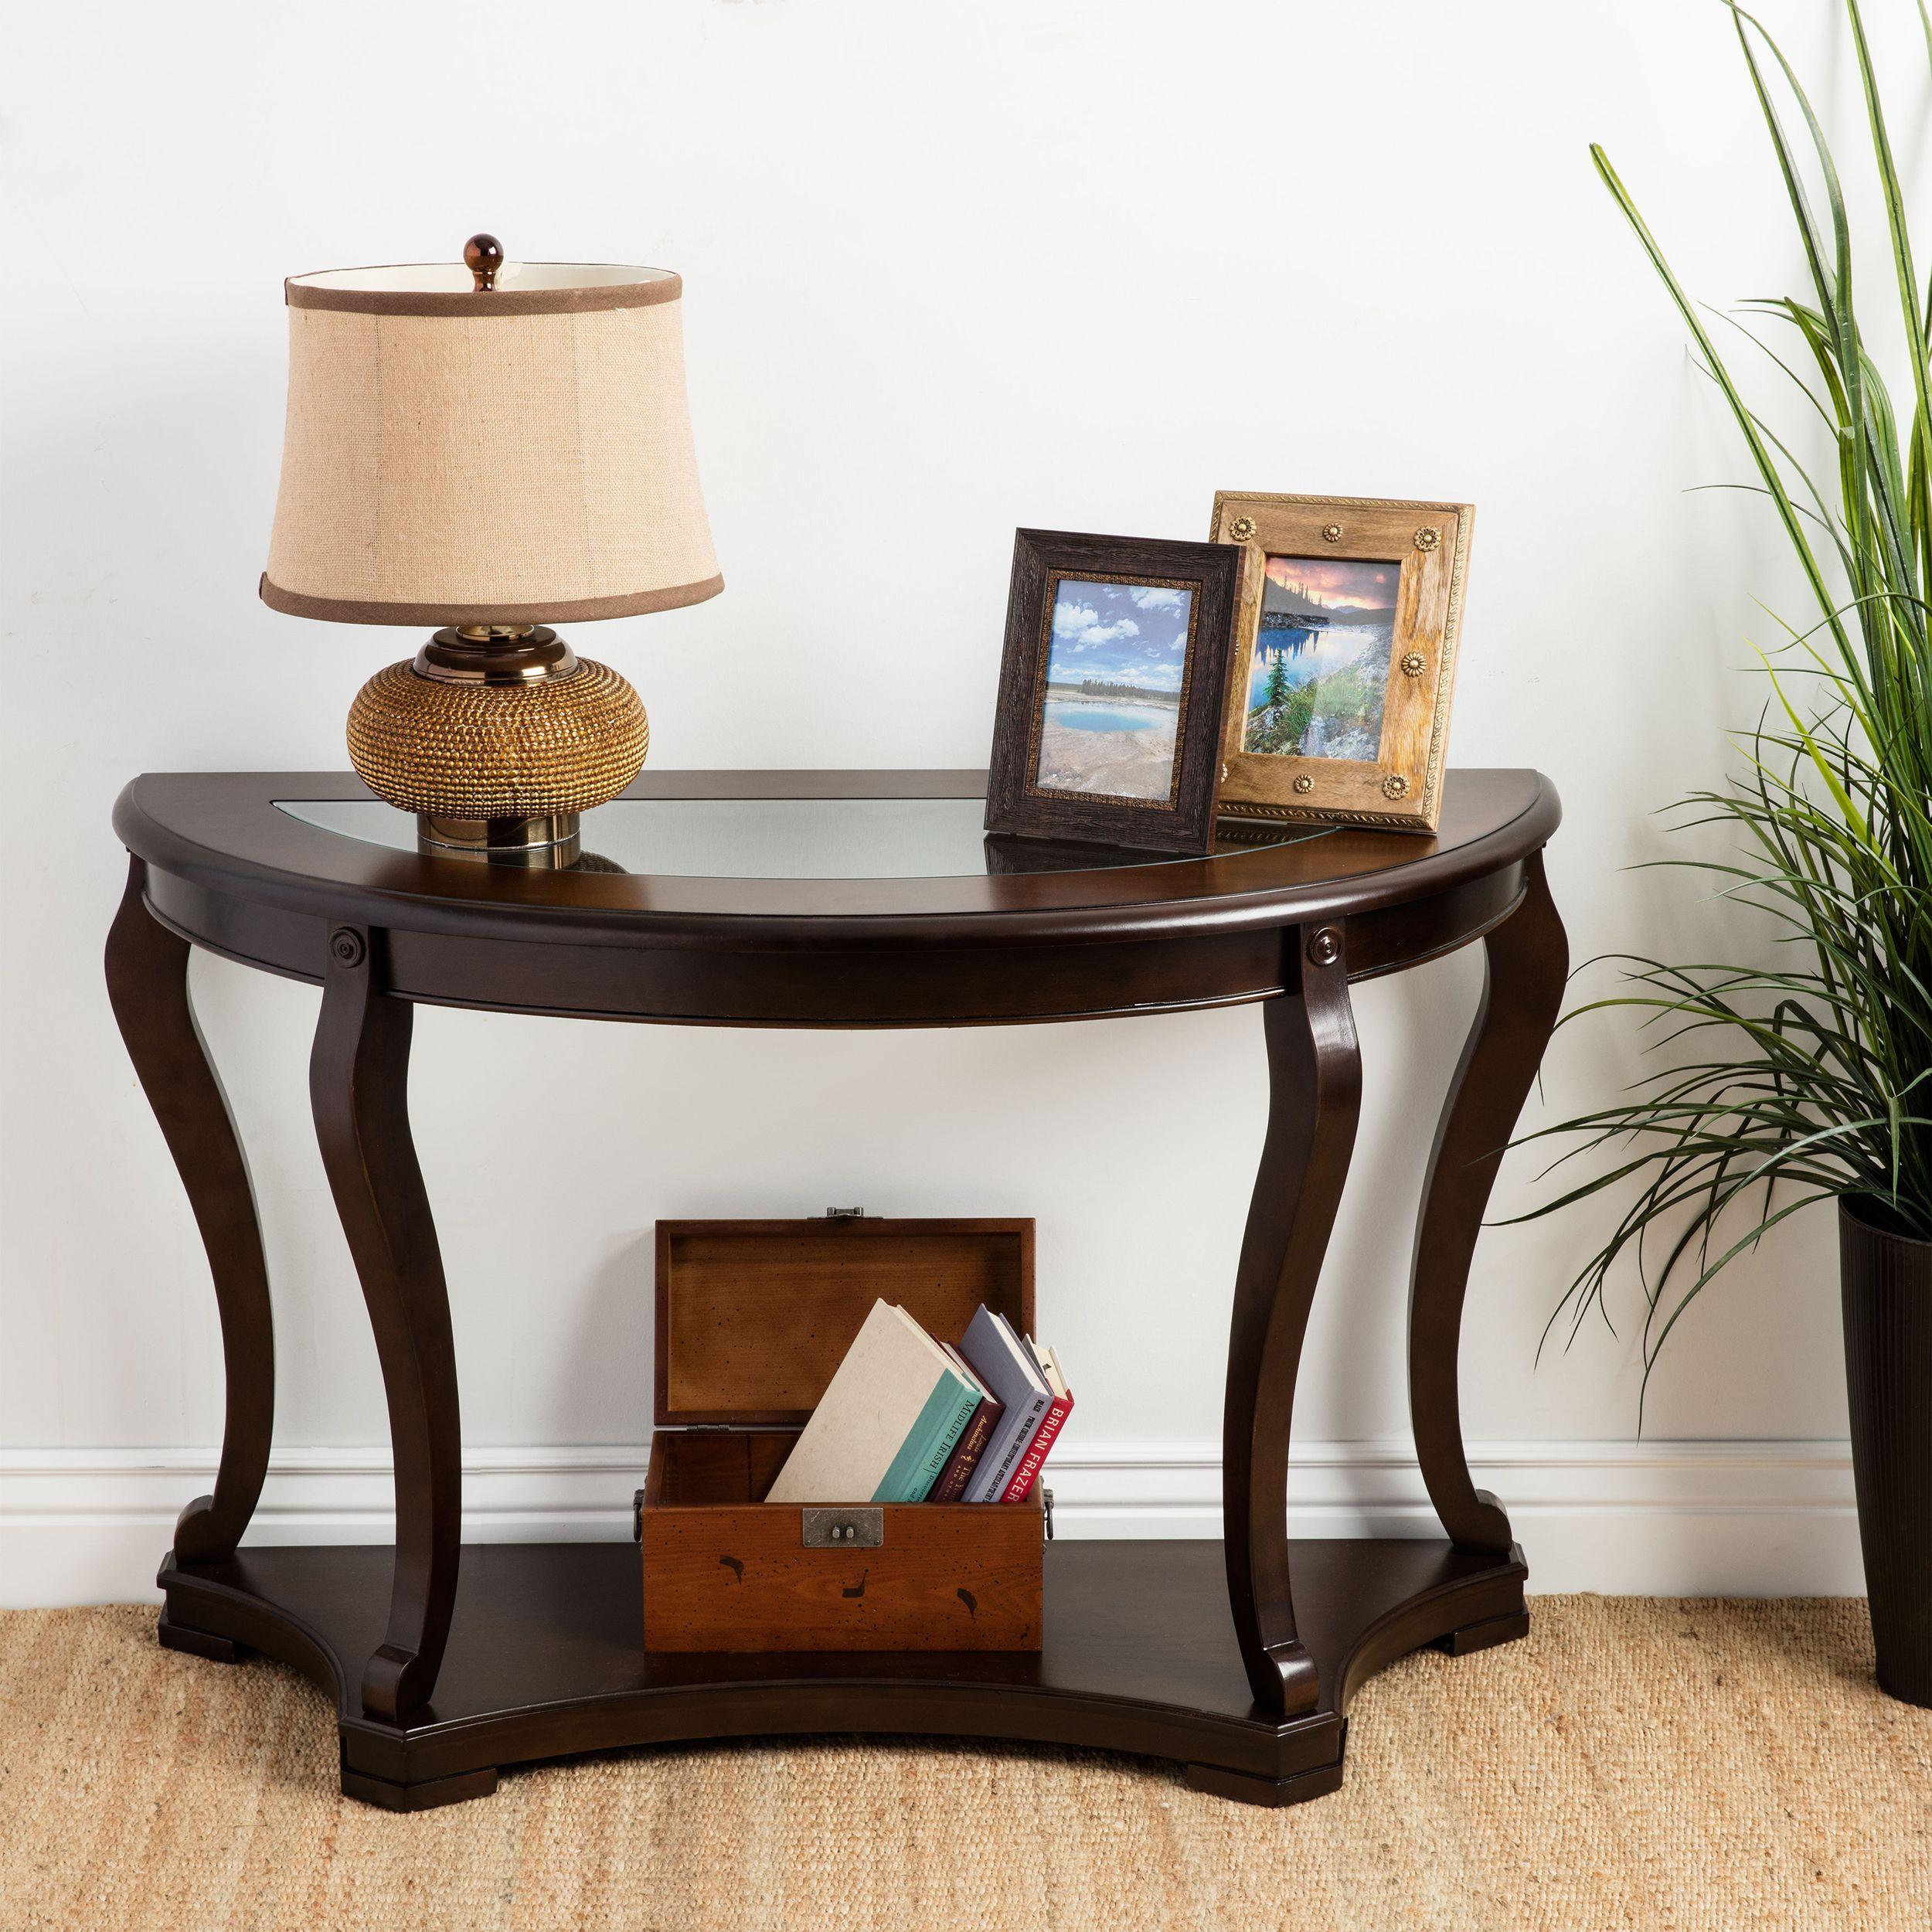 Leather Sectional Sofas for Modern Living Room   Para el hogar ...